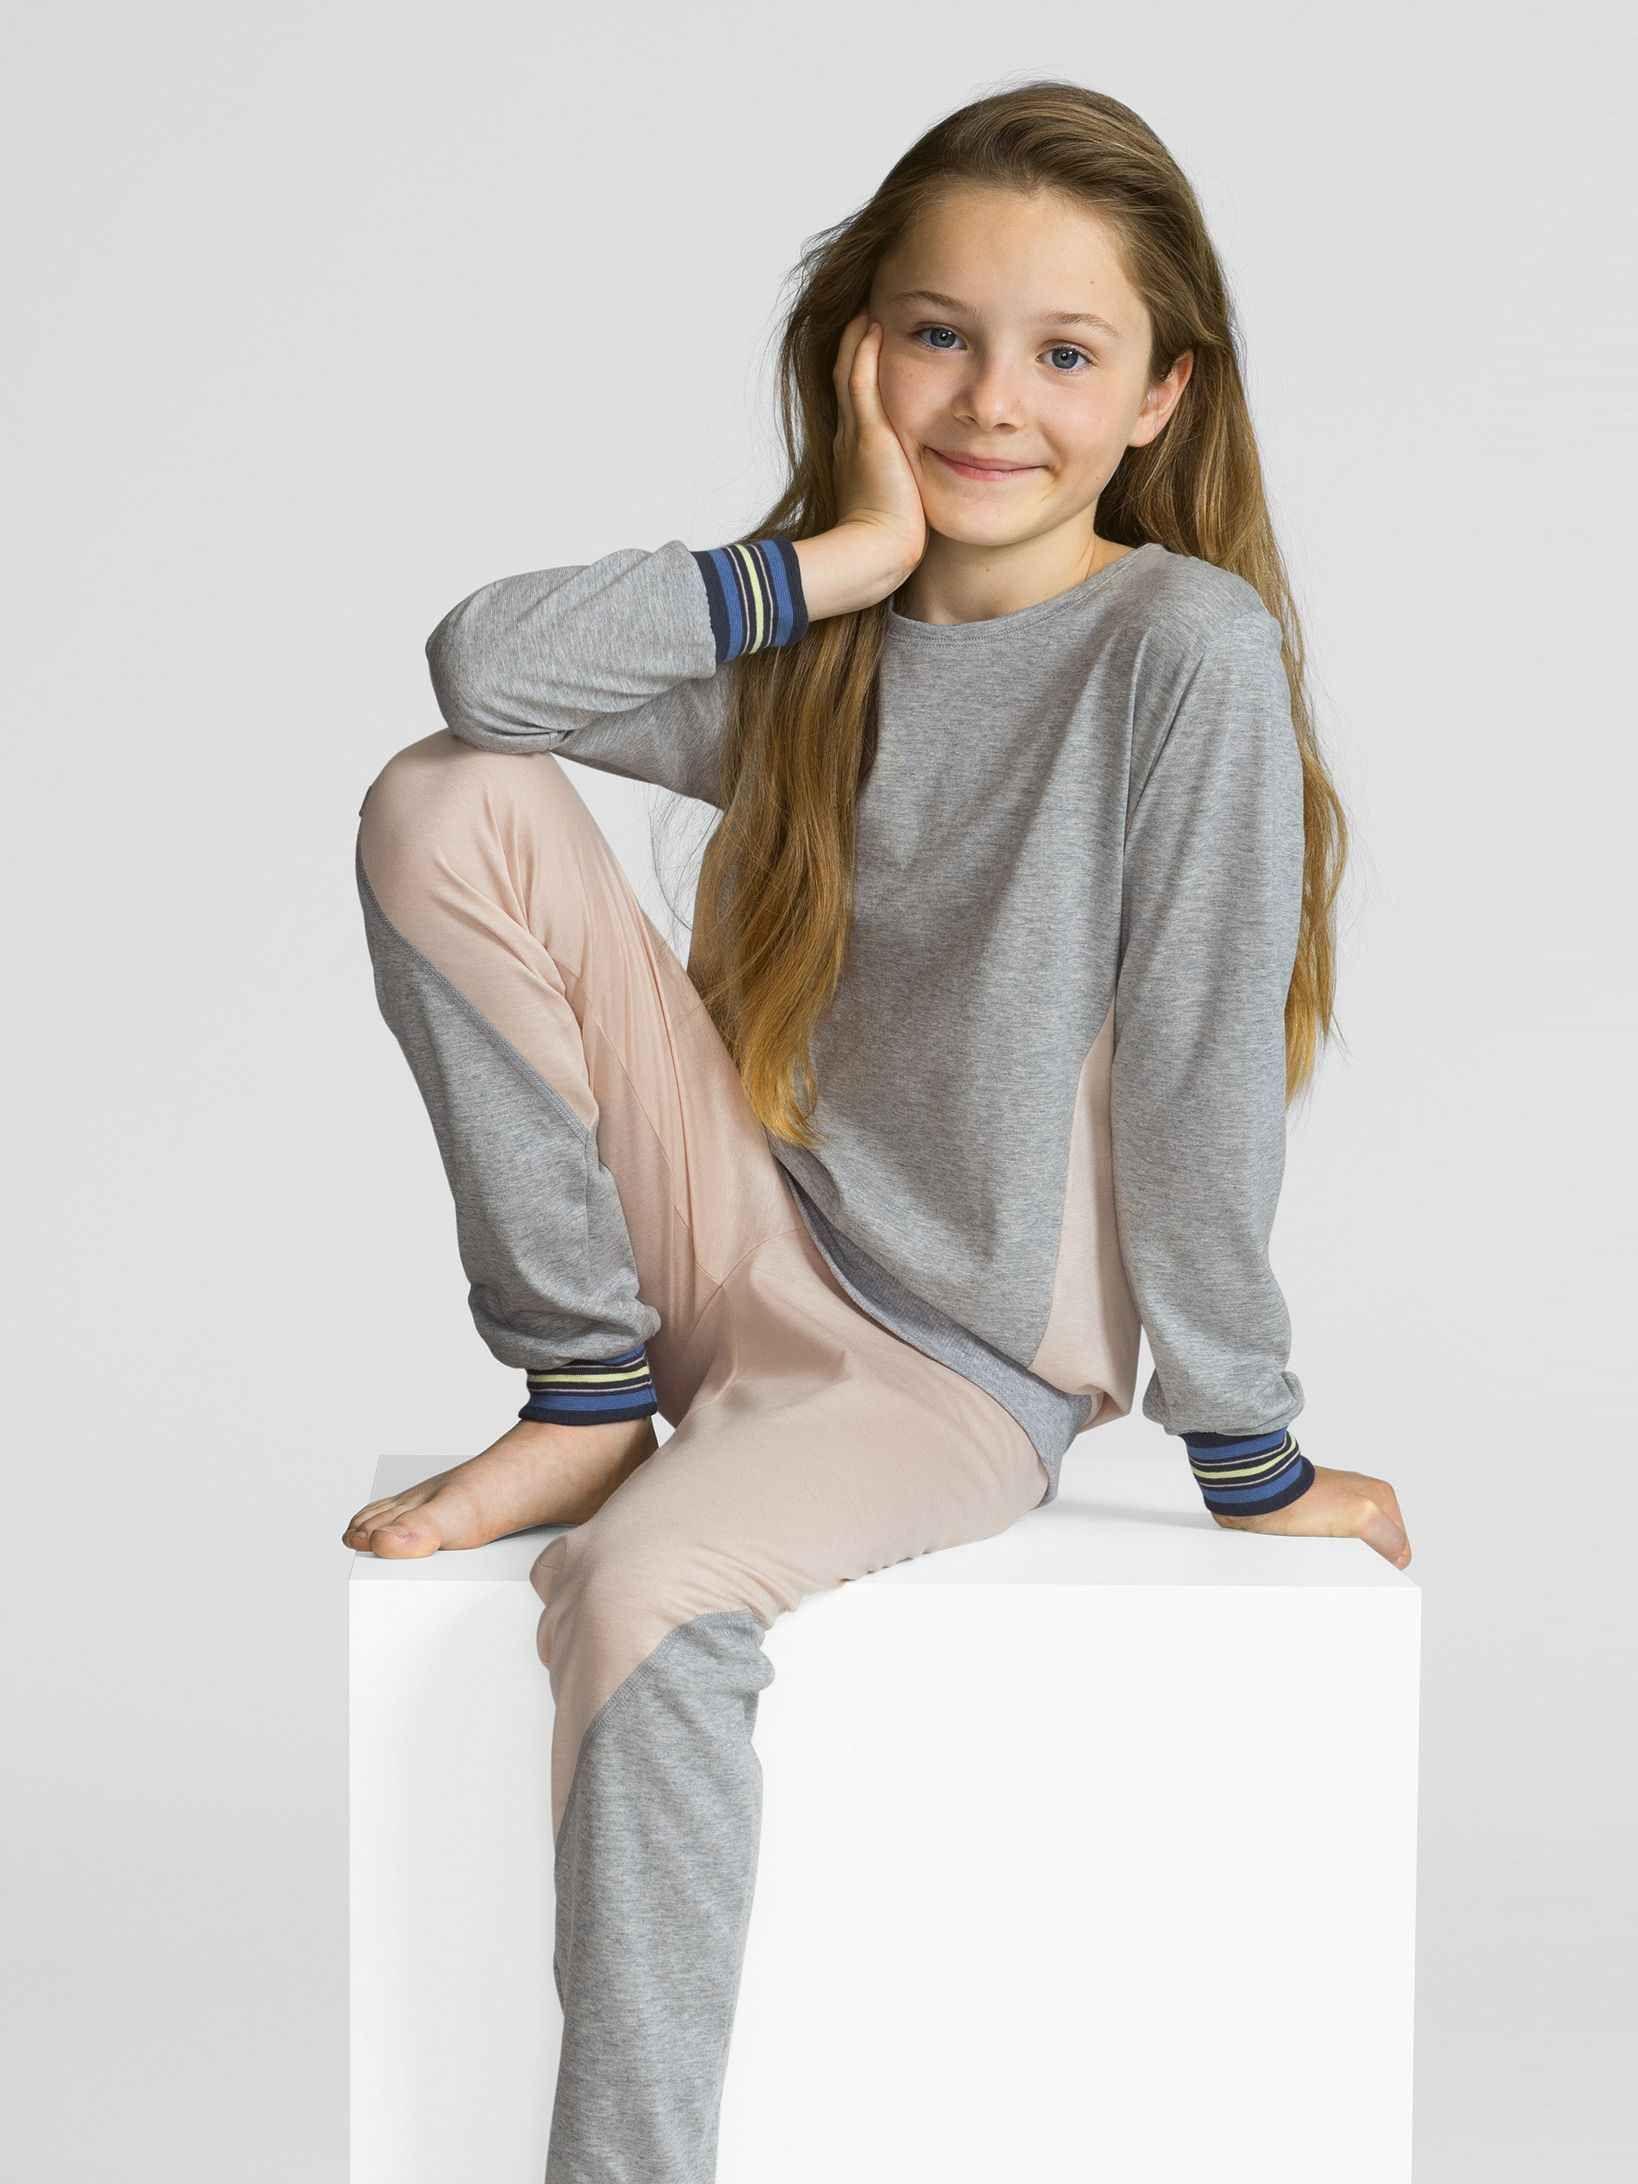 Kinder Calida Athleisure Girl Madchen Bundchenpyjama 07613381023020 Mode Ootd Outfit Fashion Style Online Kinder C Fashion Womens Fashion Girl